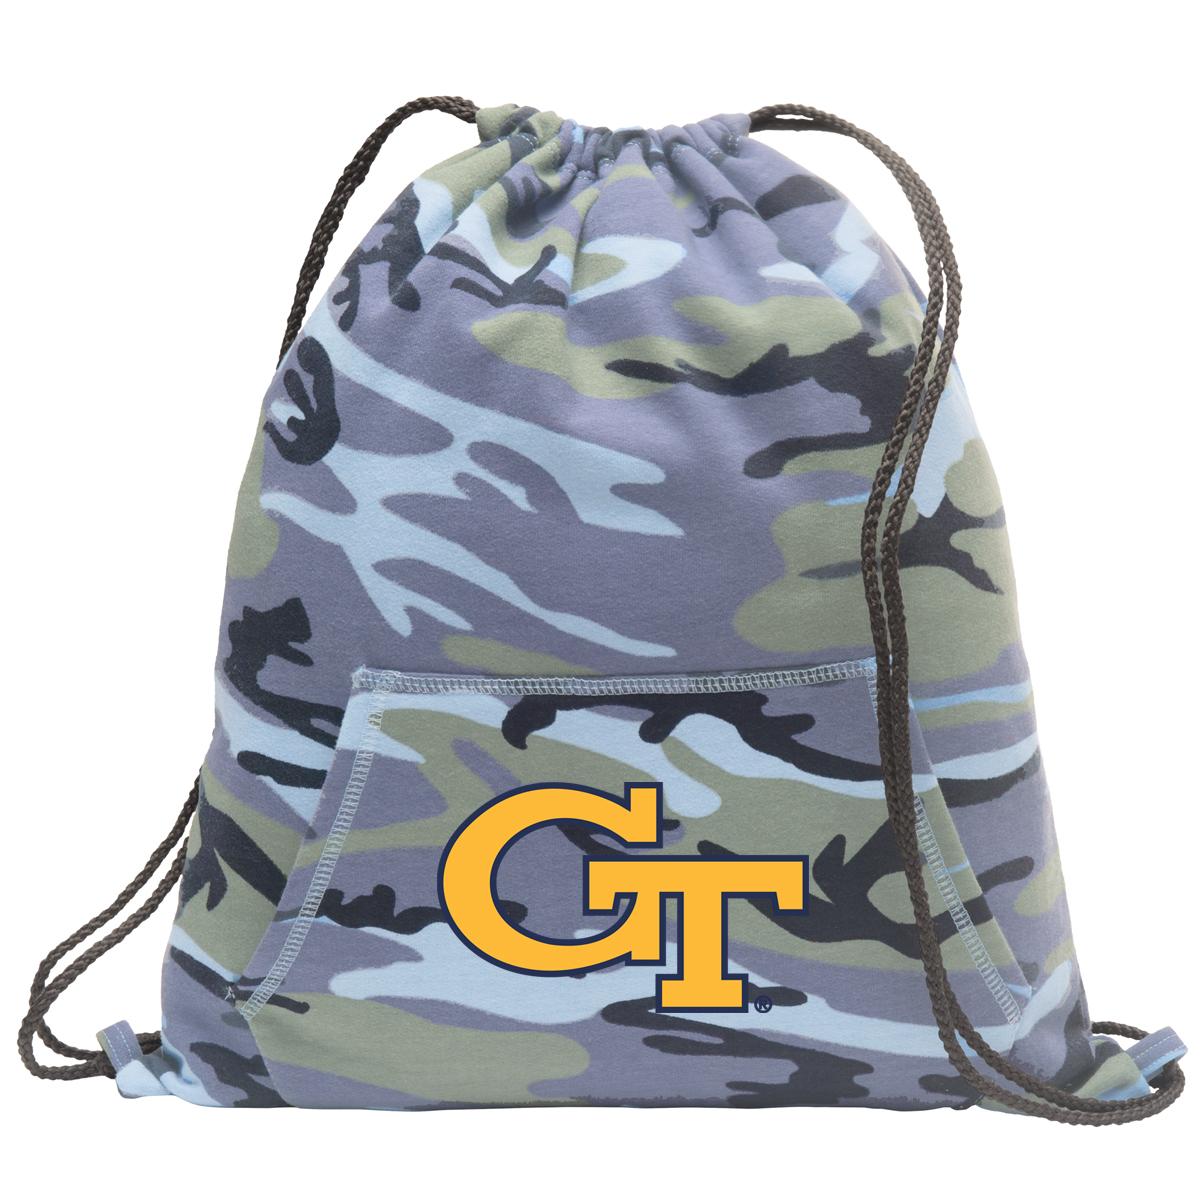 Georgia Tech Drawstring Bag Blue Camo Official Georgia Tech Cinch Backpack for Boys Girls Men Women